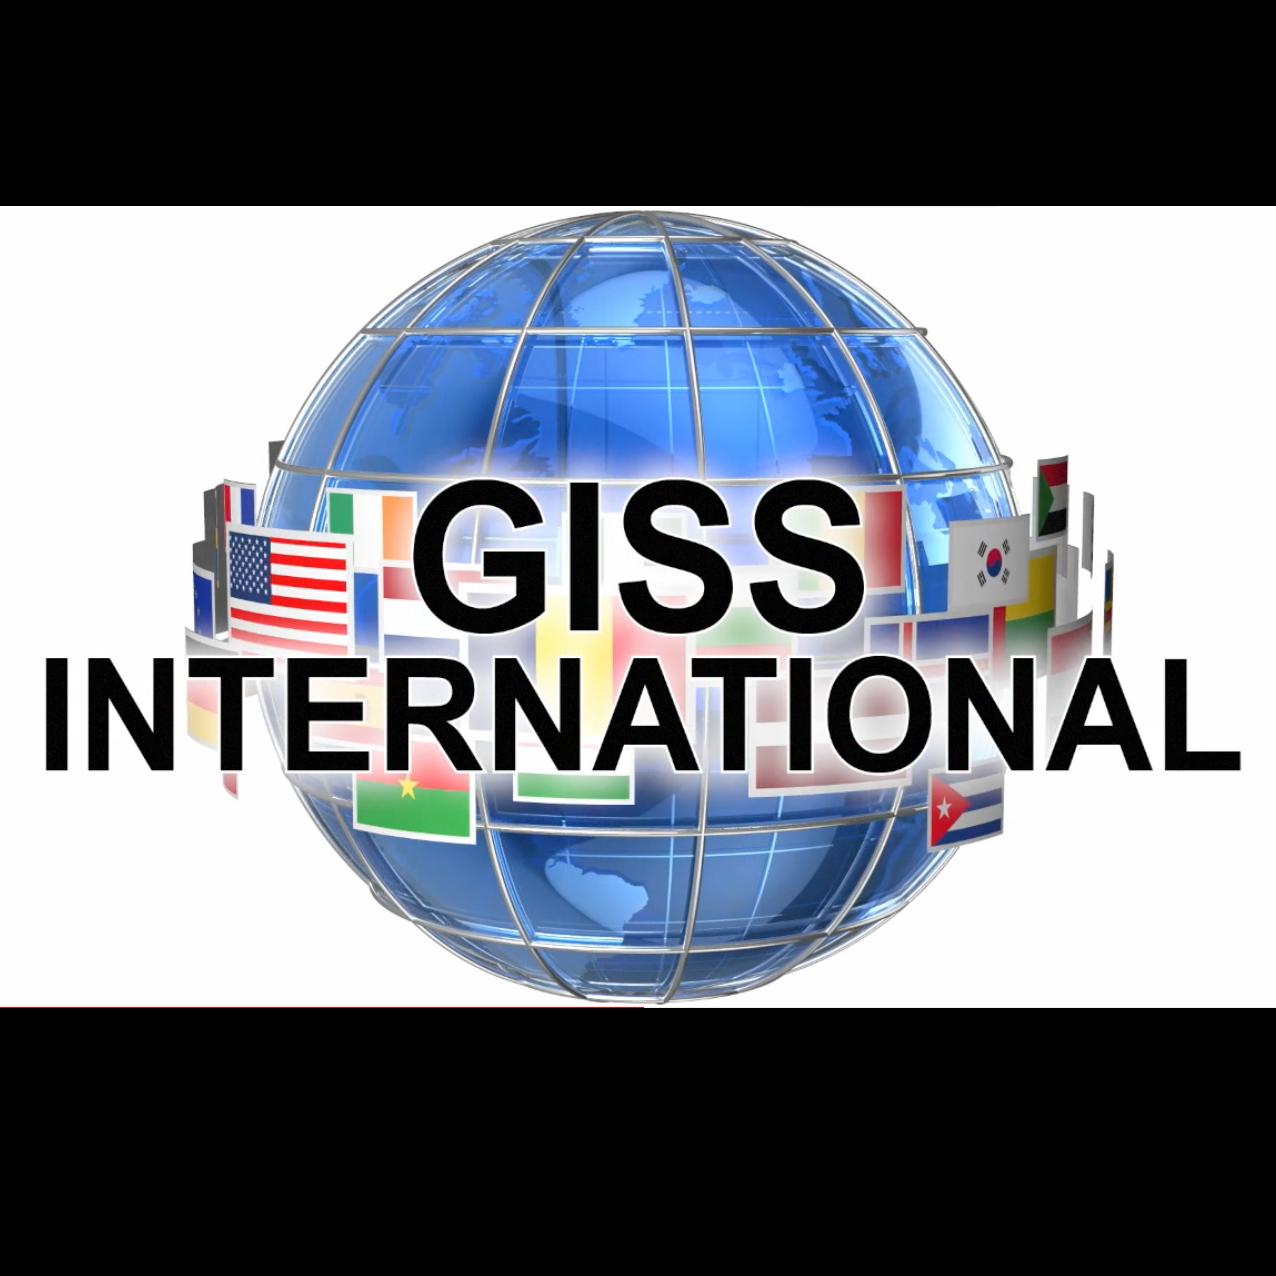 GISS International